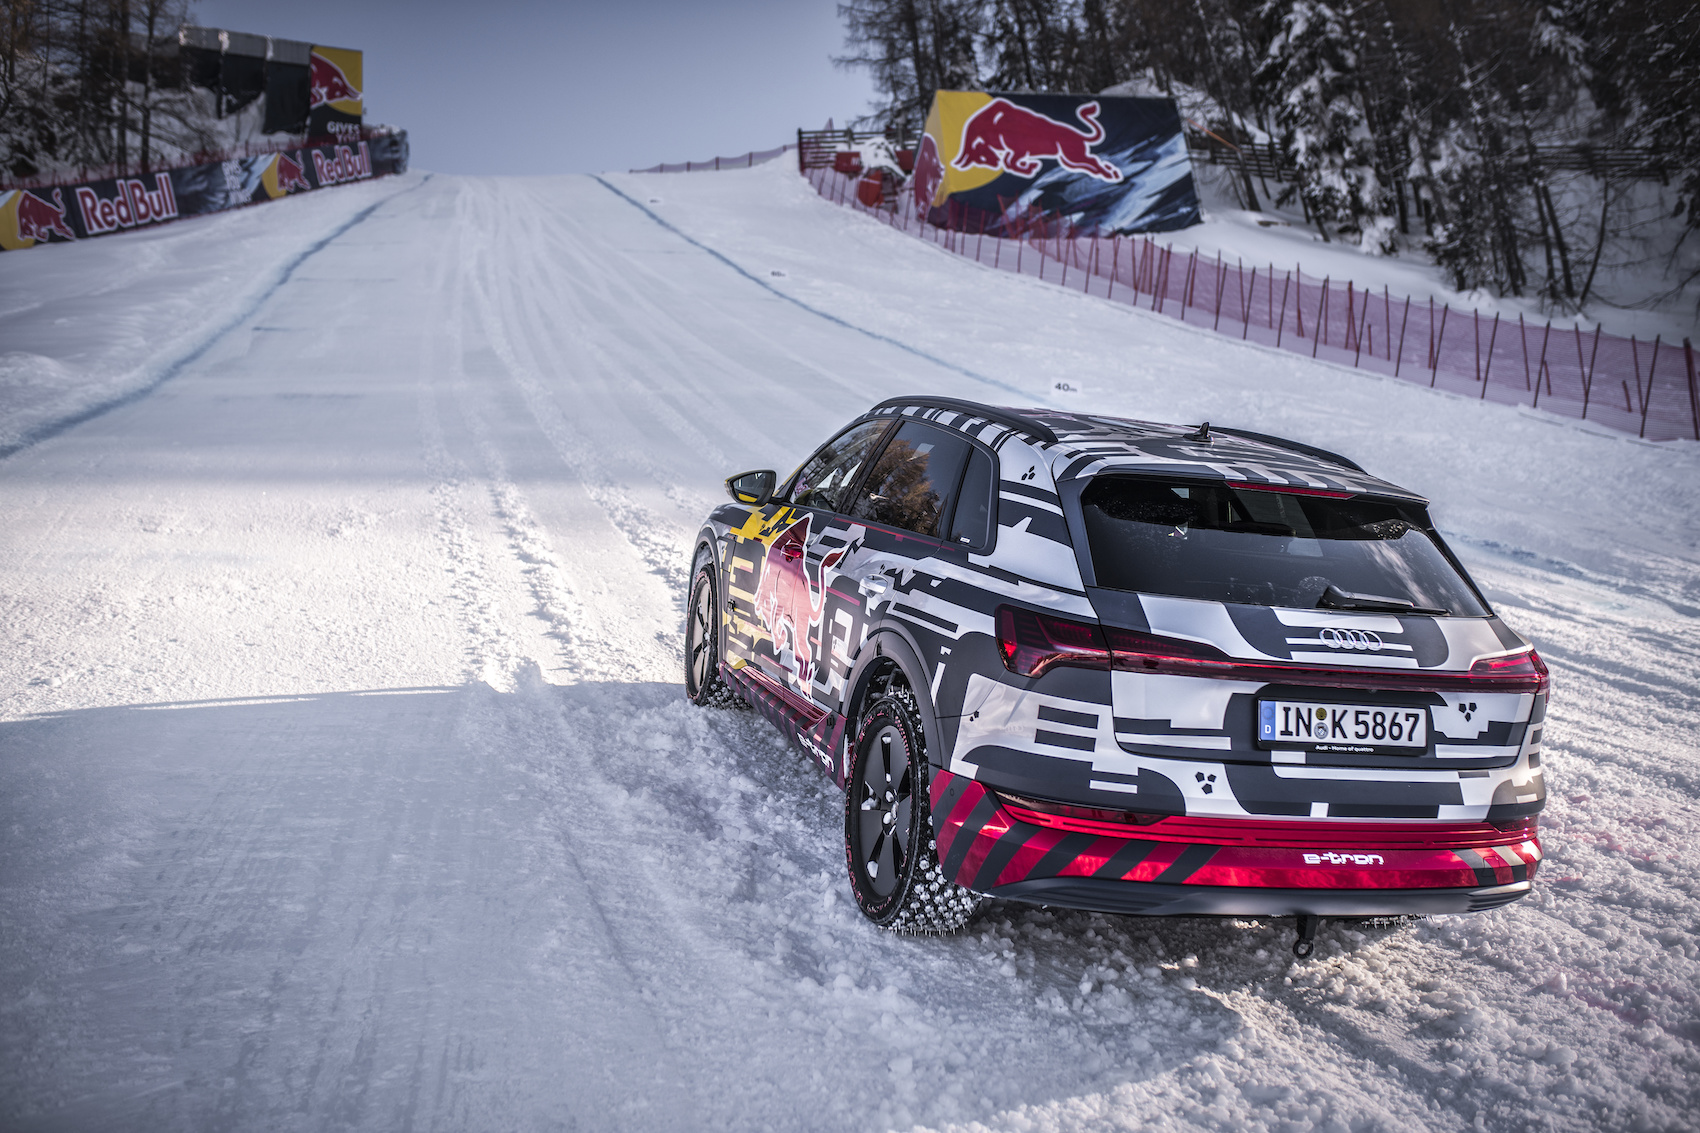 La «neve-tron» era dotata di gomme chiodate sviluppate per l'occasione. (Foto: Audi)